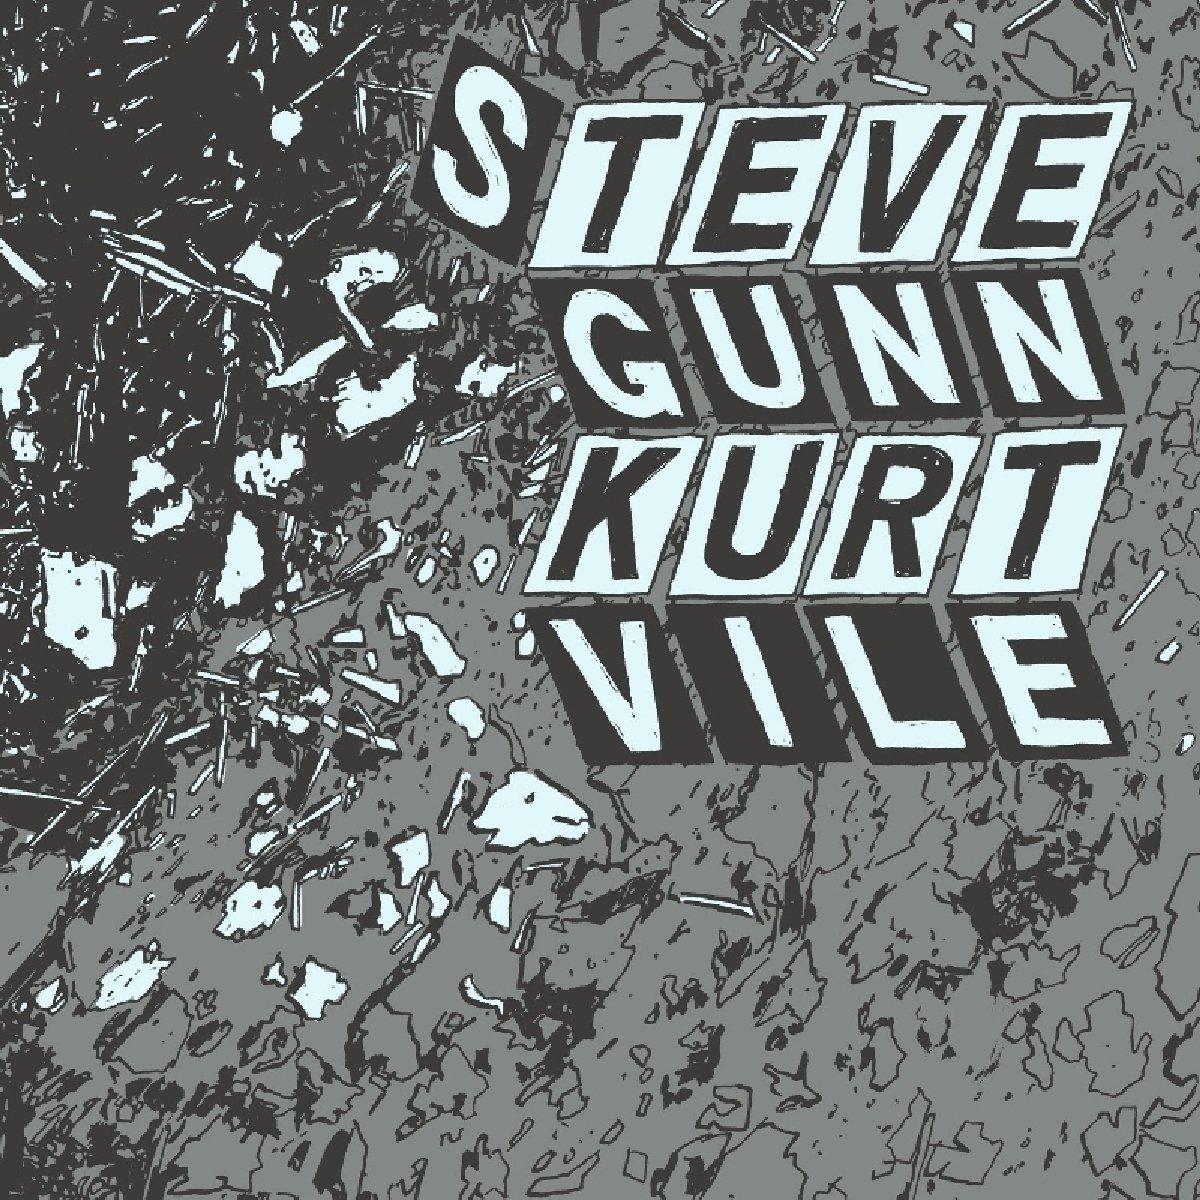 Parallelogram High material A La Carte: Large discharge sale Gunn Vile Steve Kurt